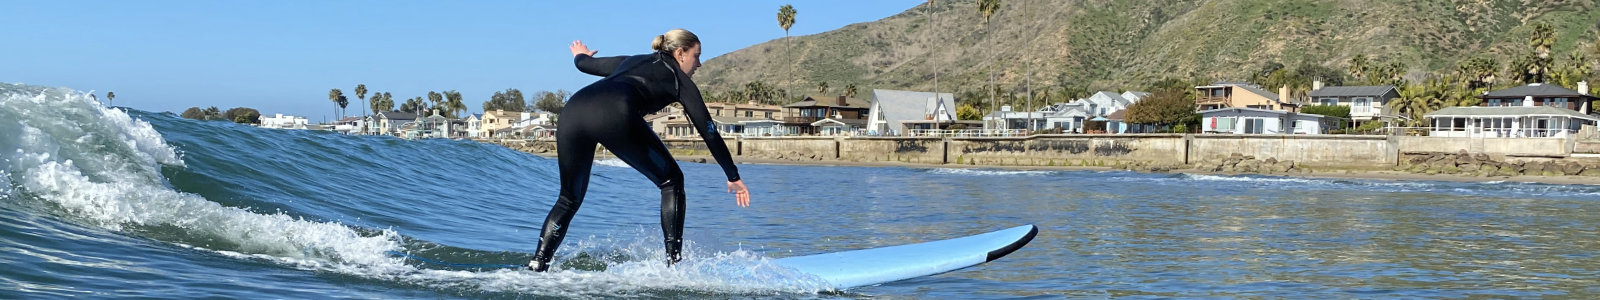 surfboard rental on waves at mondos